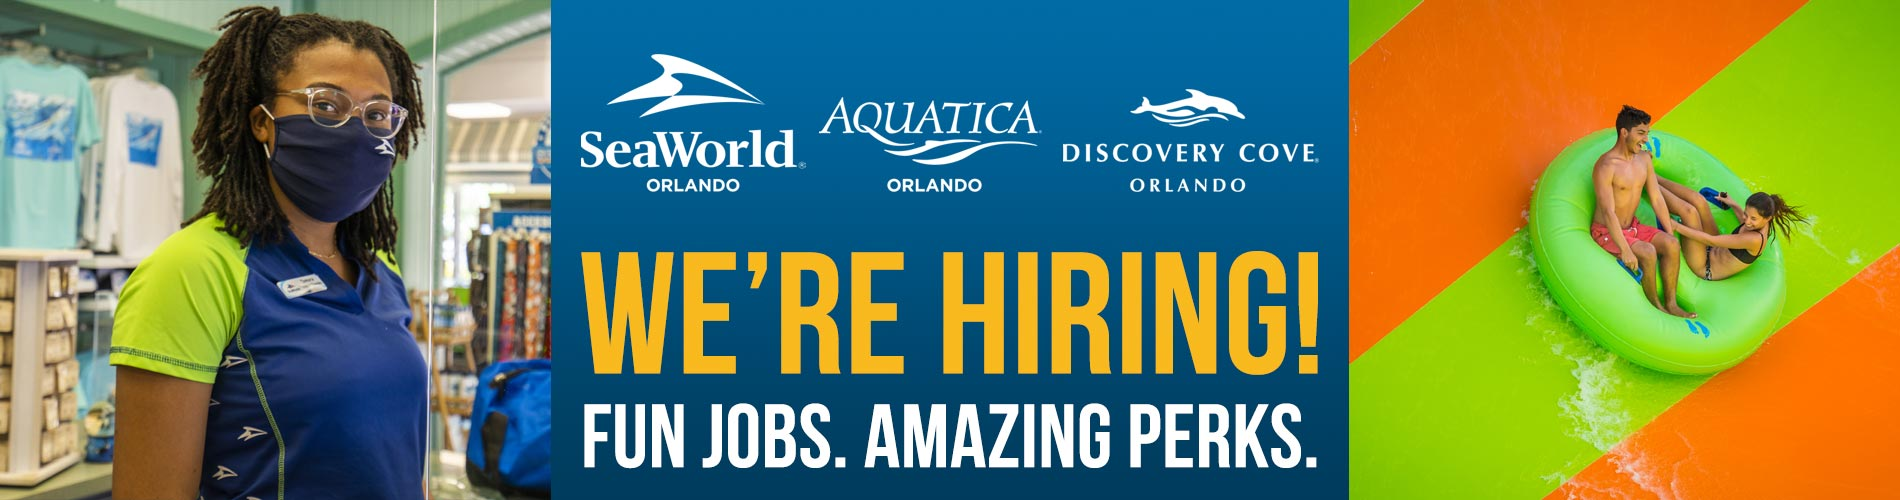 Fun Jobs and Amazing Perks at SeaWorld Aquatica Discovey Cove Orlando